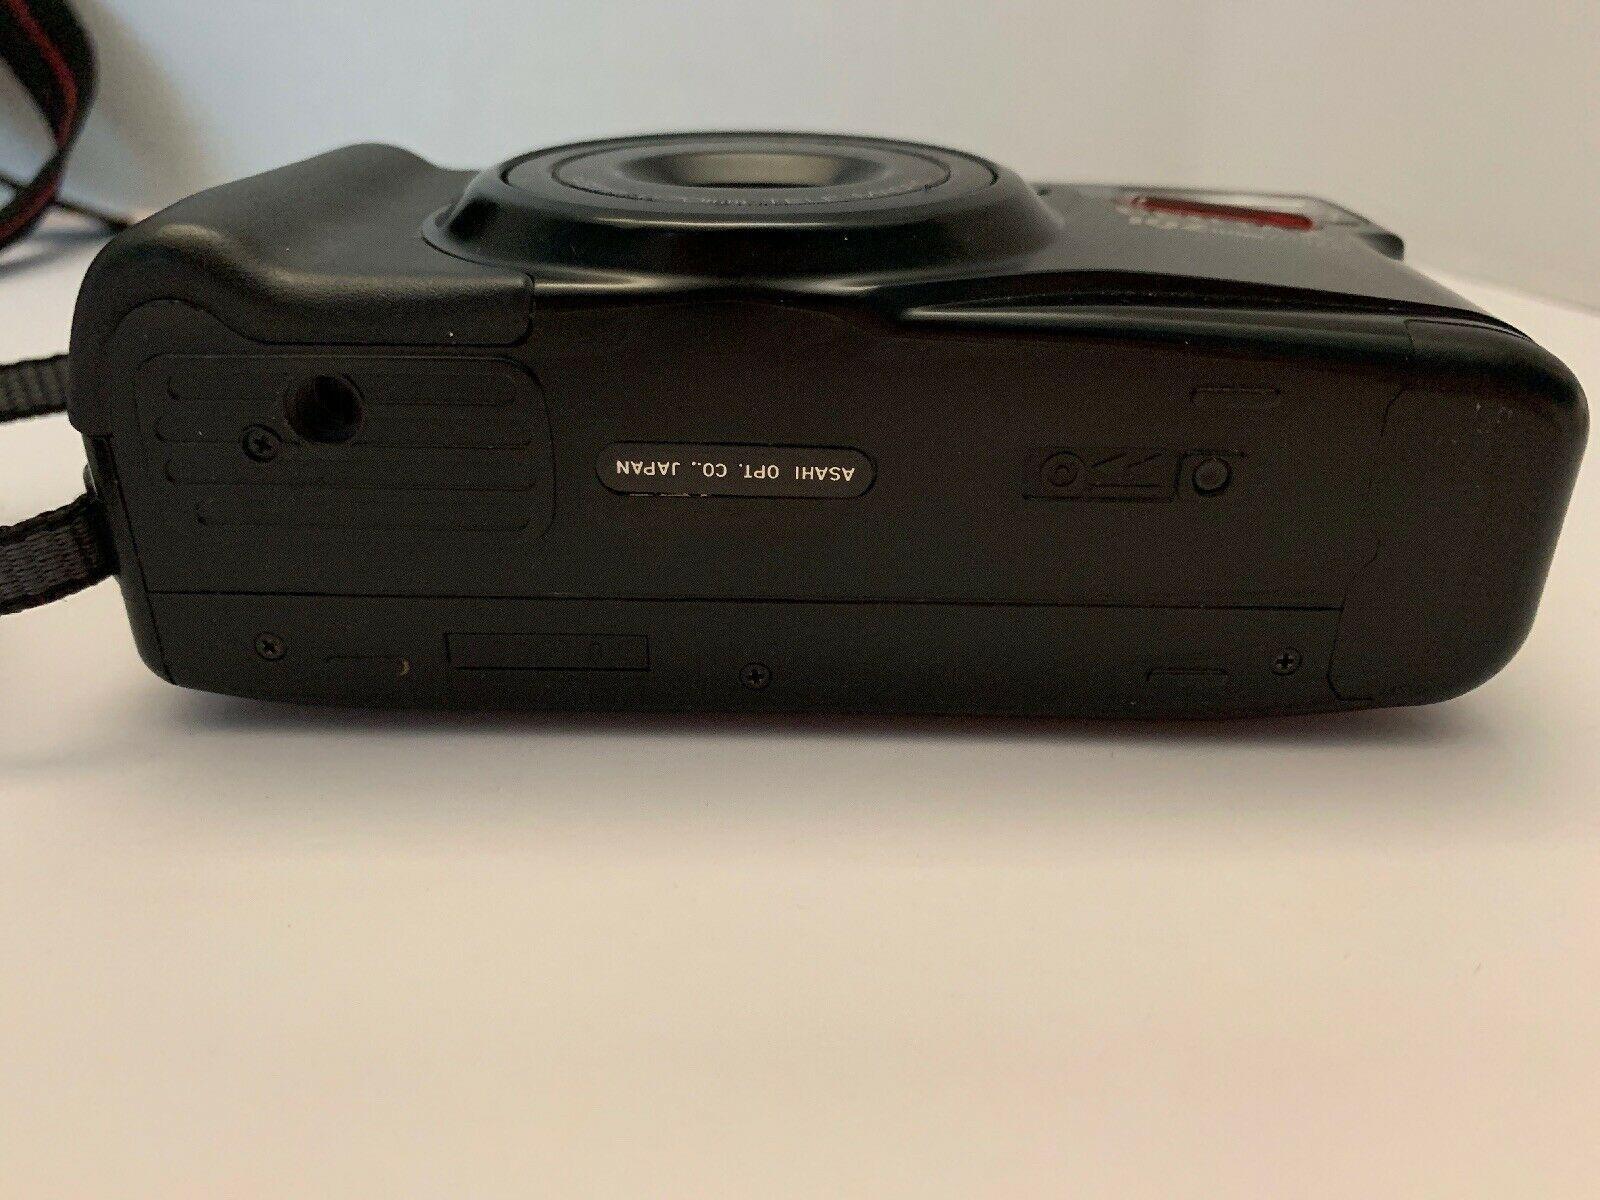 Vintage Pentax IQ Zoom 700 35mm Film Camera 35-70mm Lens With Pentax Case Black